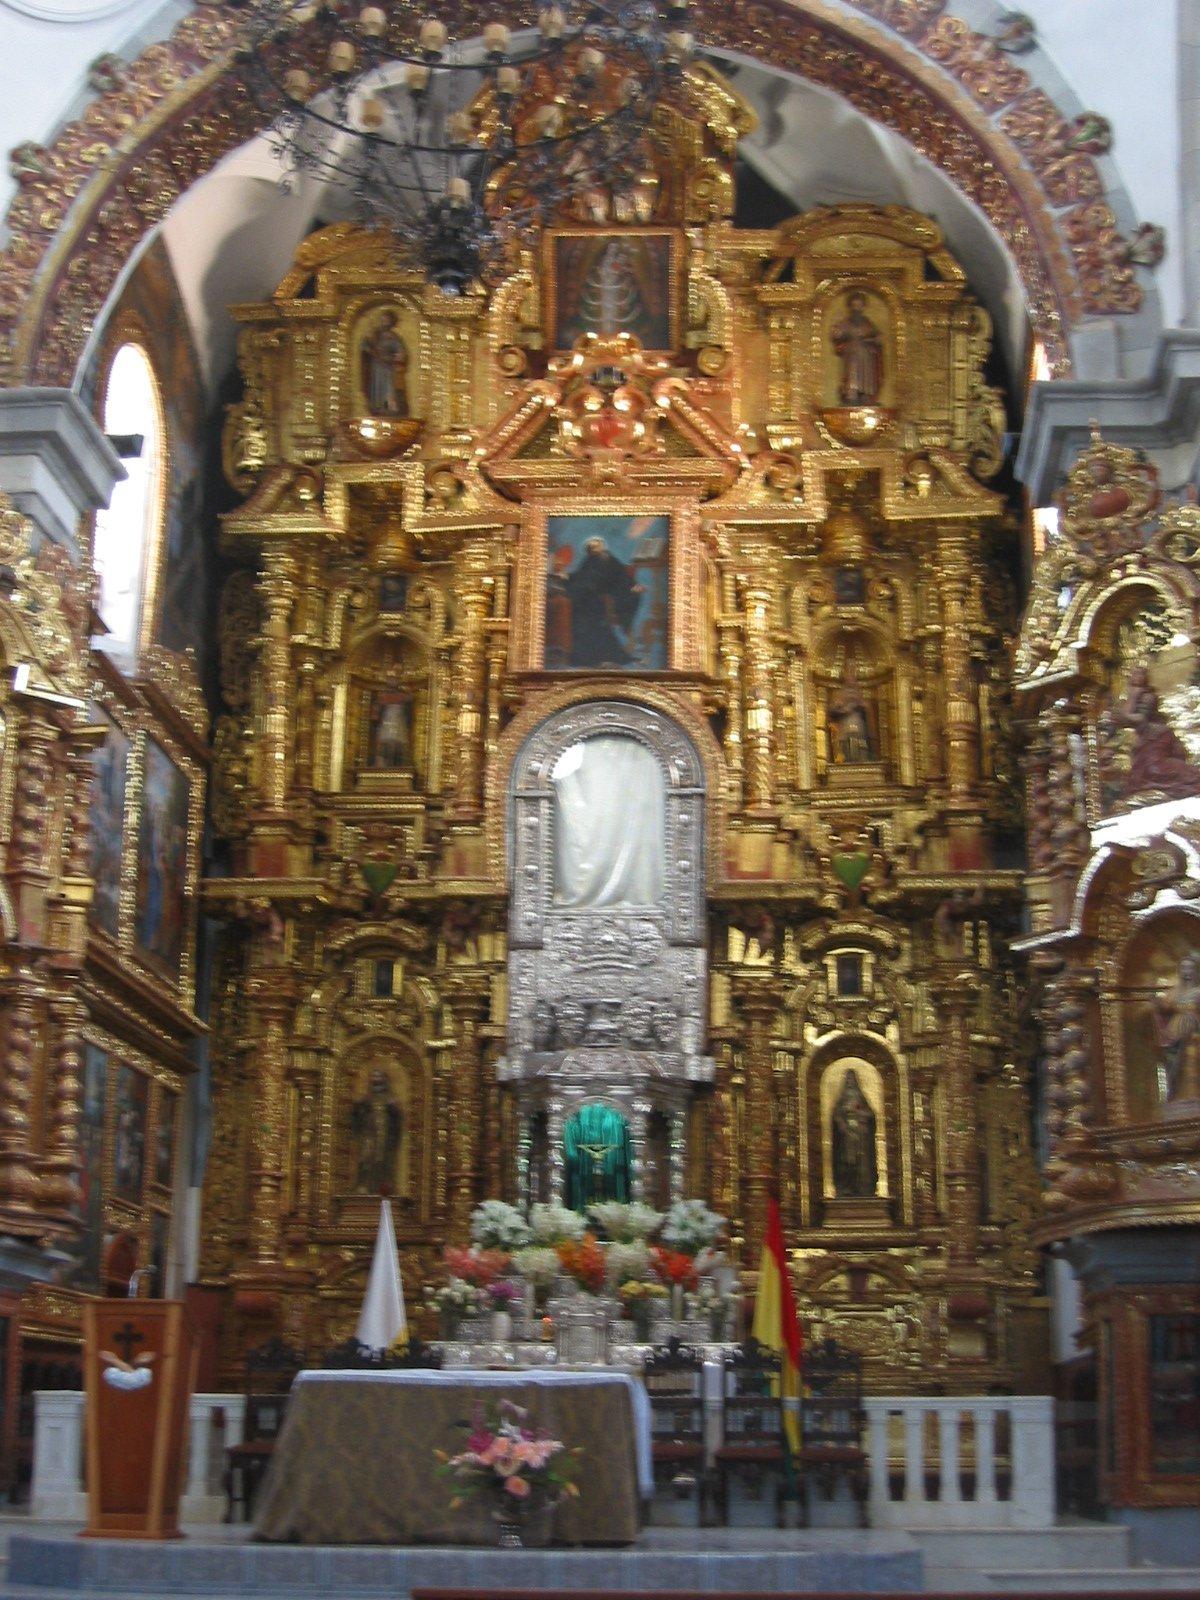 Ornate altar in the Basilica